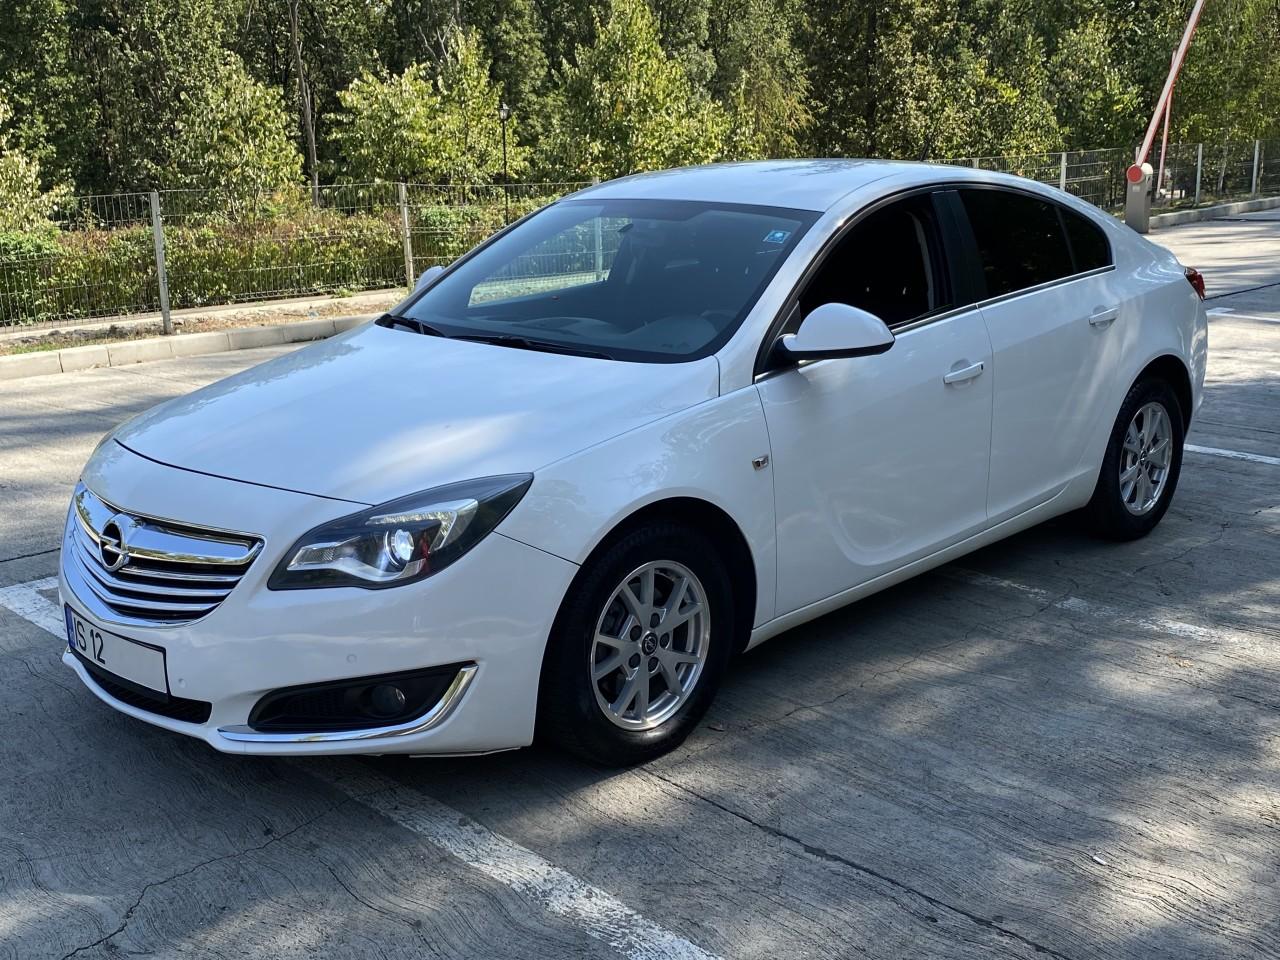 Opel Insignia 2.0 TDI full led fab. 2014